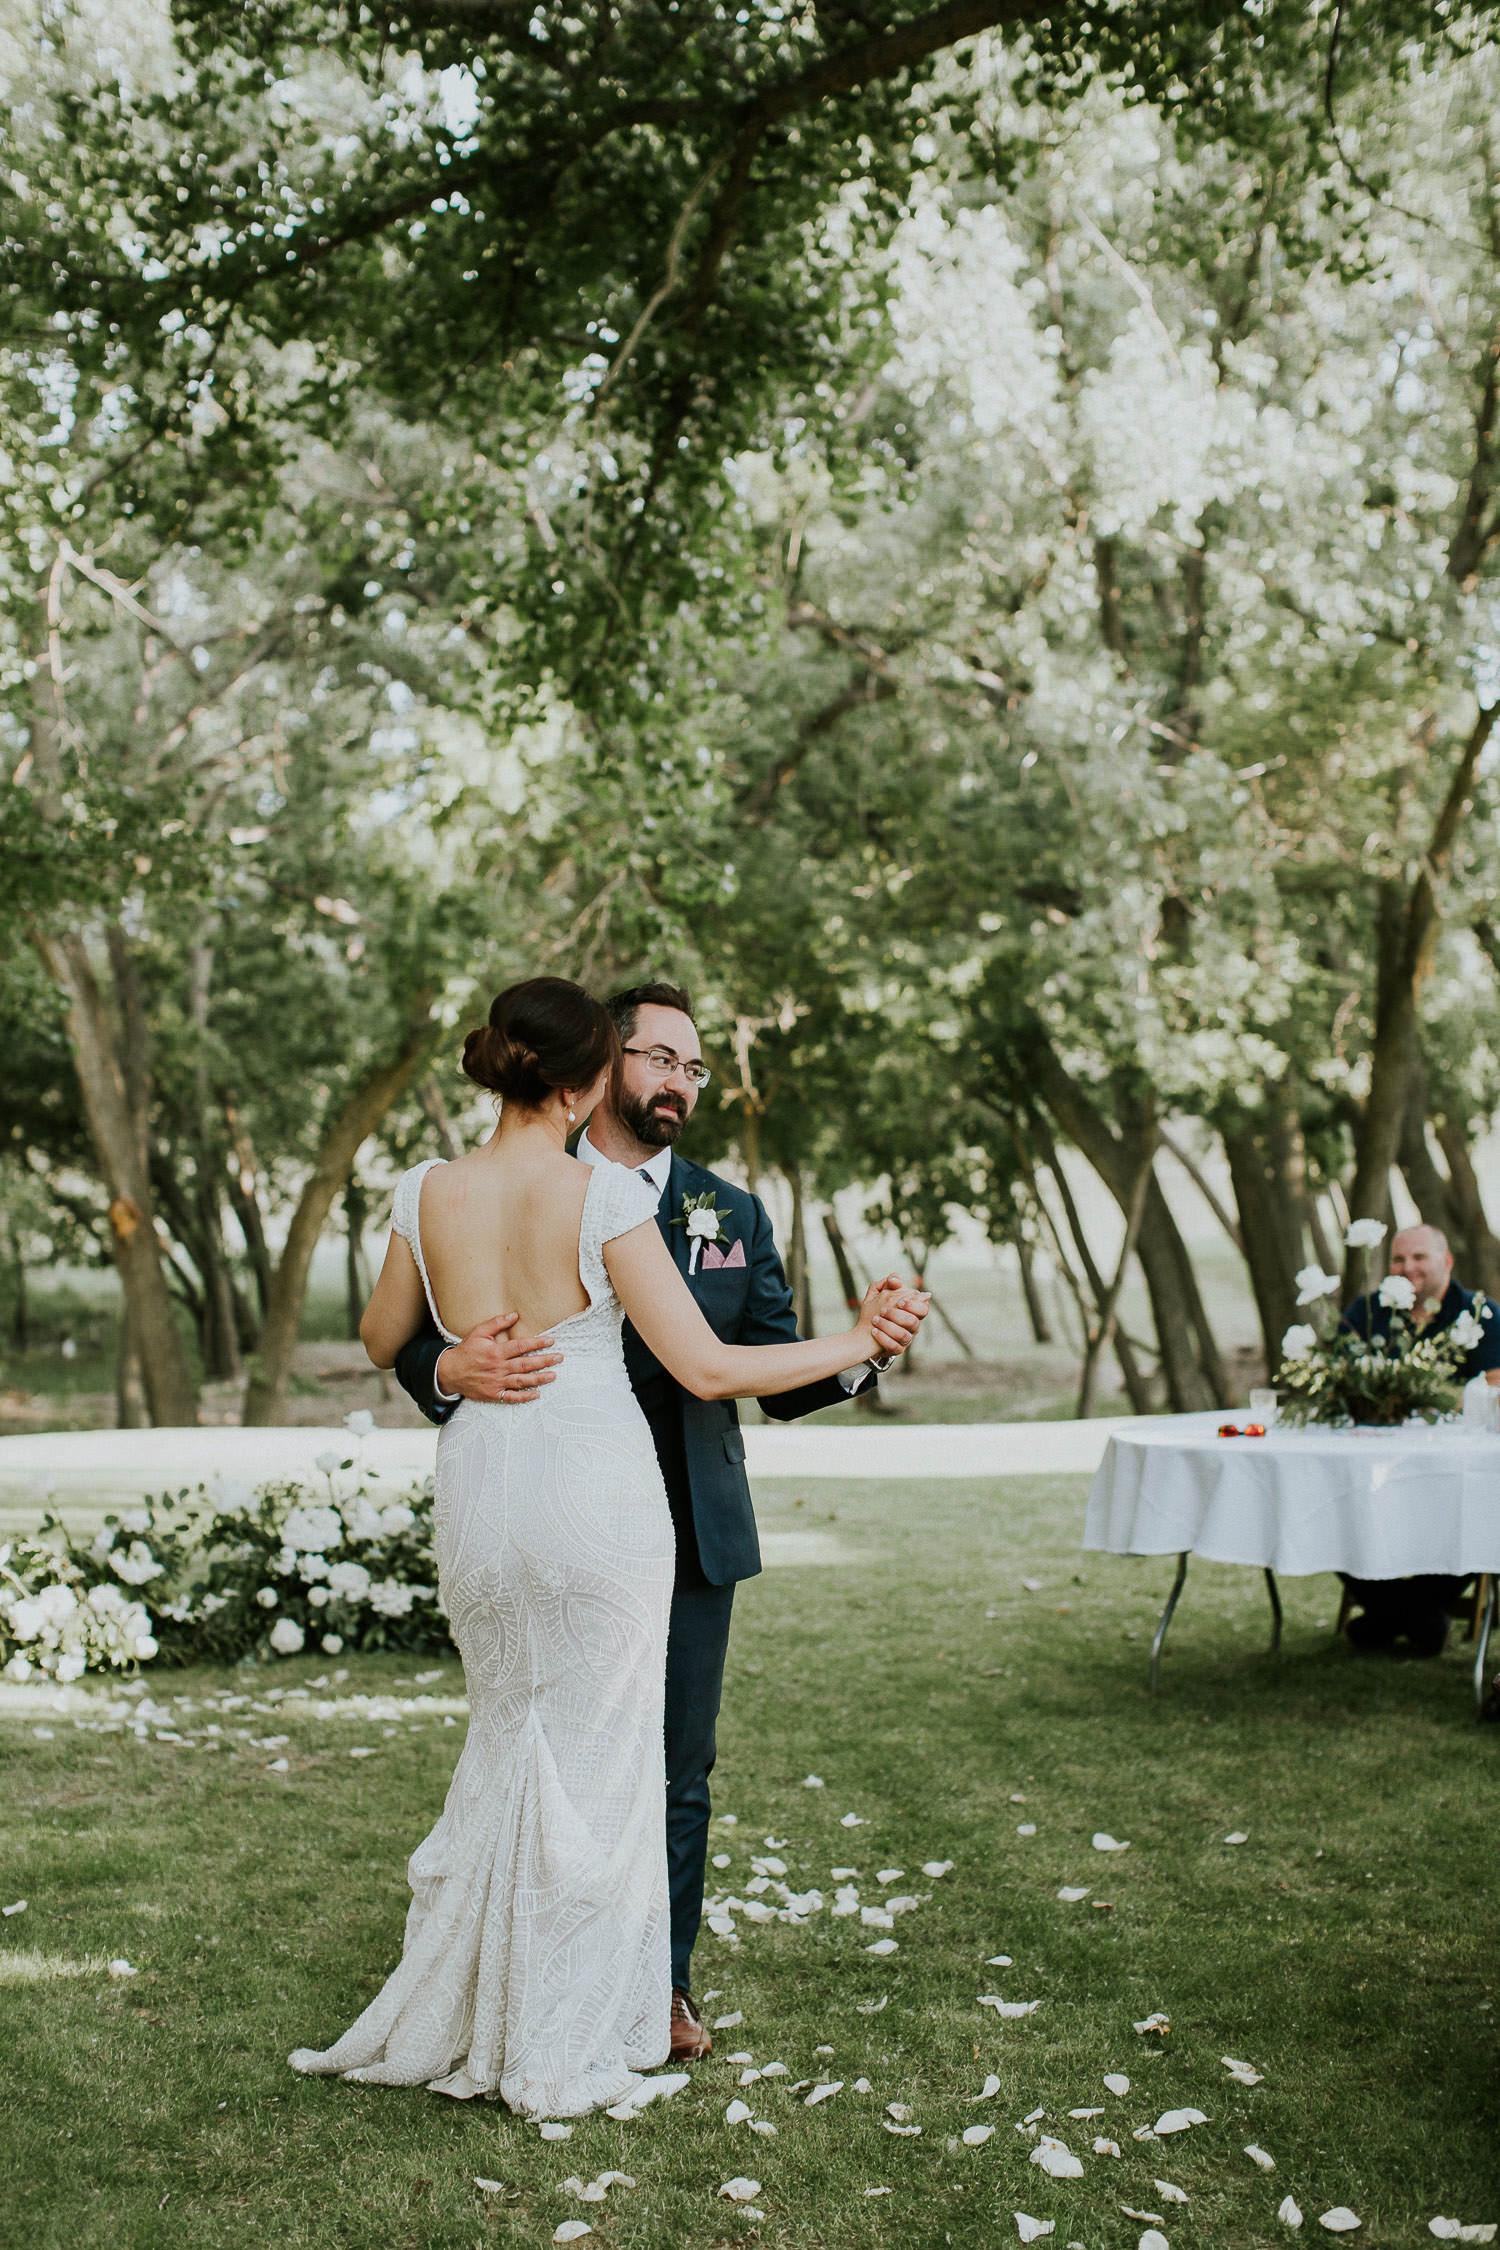 summer-backyard-wedding-in-alberta-sarah-pukin-0183